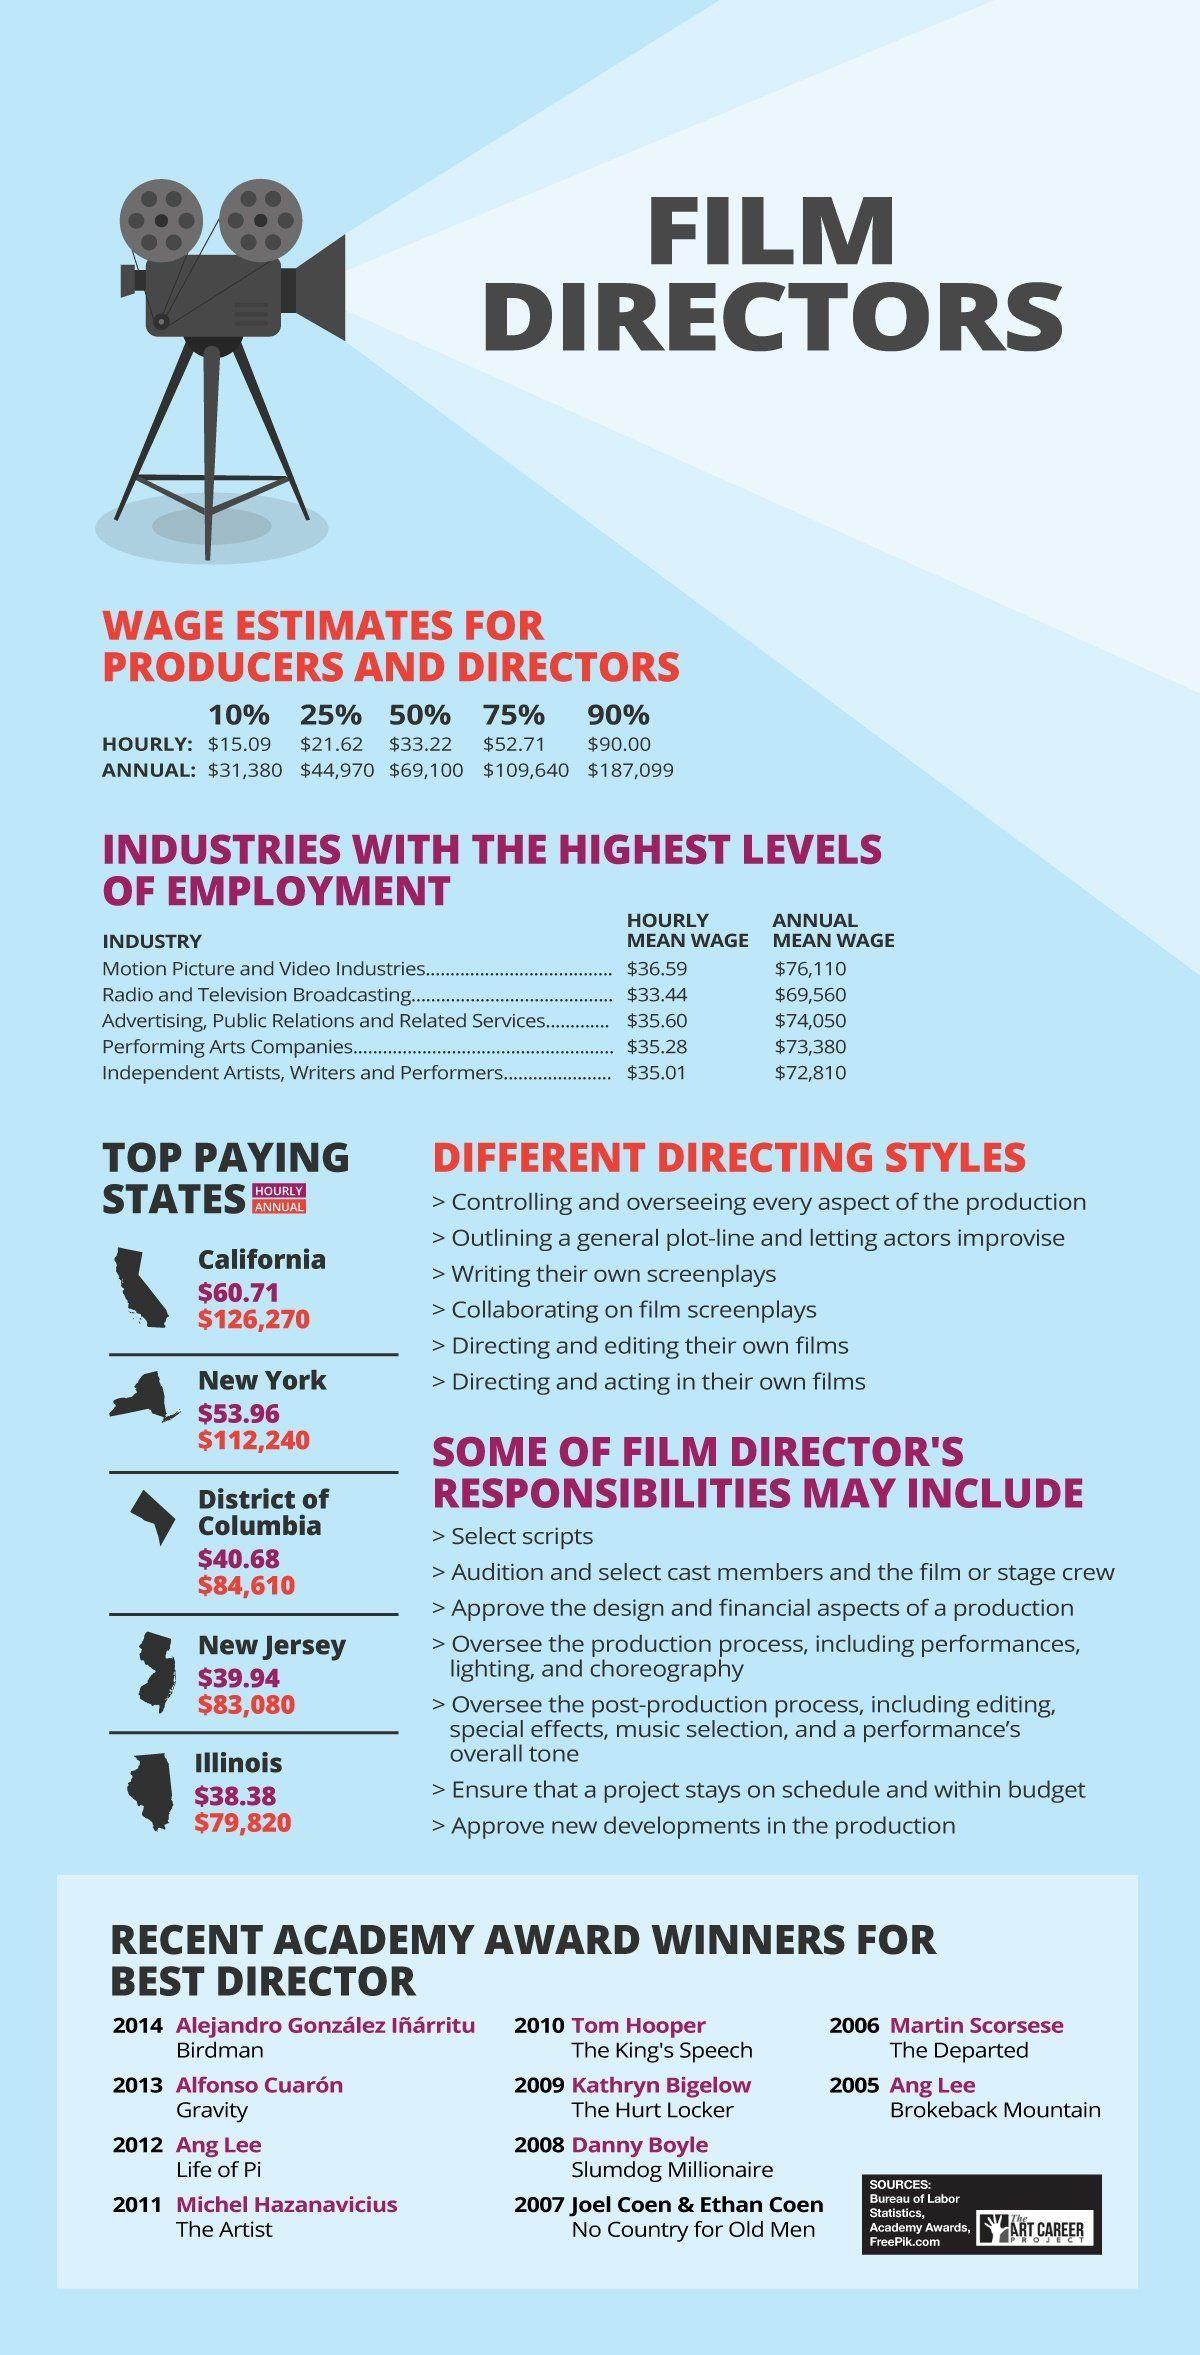 71e77488d1a668899e3596e9eb66108d - How To Get A Job As A Film Director